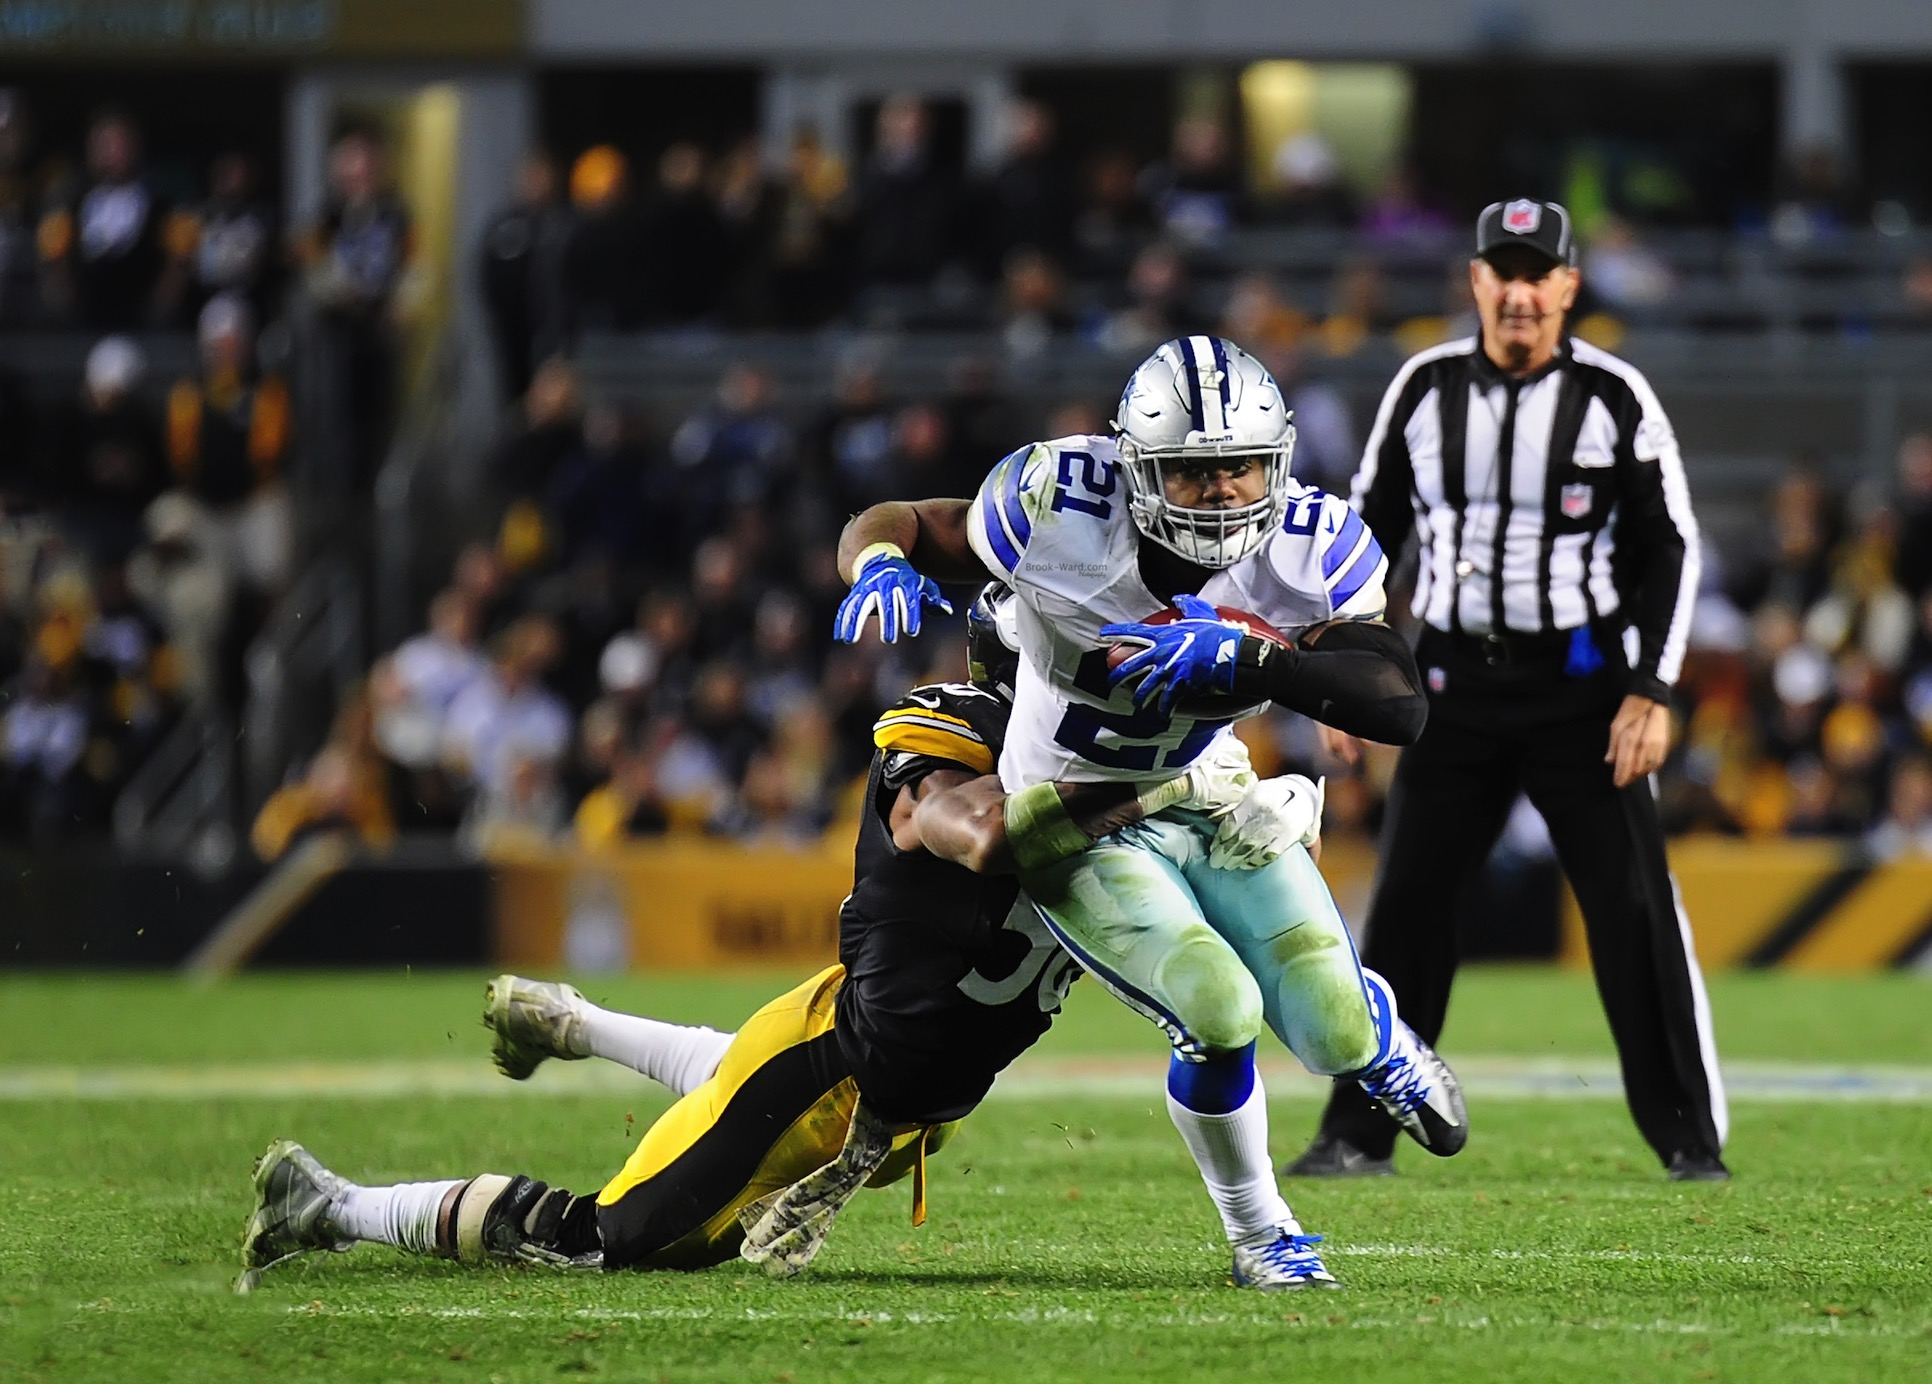 Ezekiel Elliott finishing a strong run against the Steelers defense.